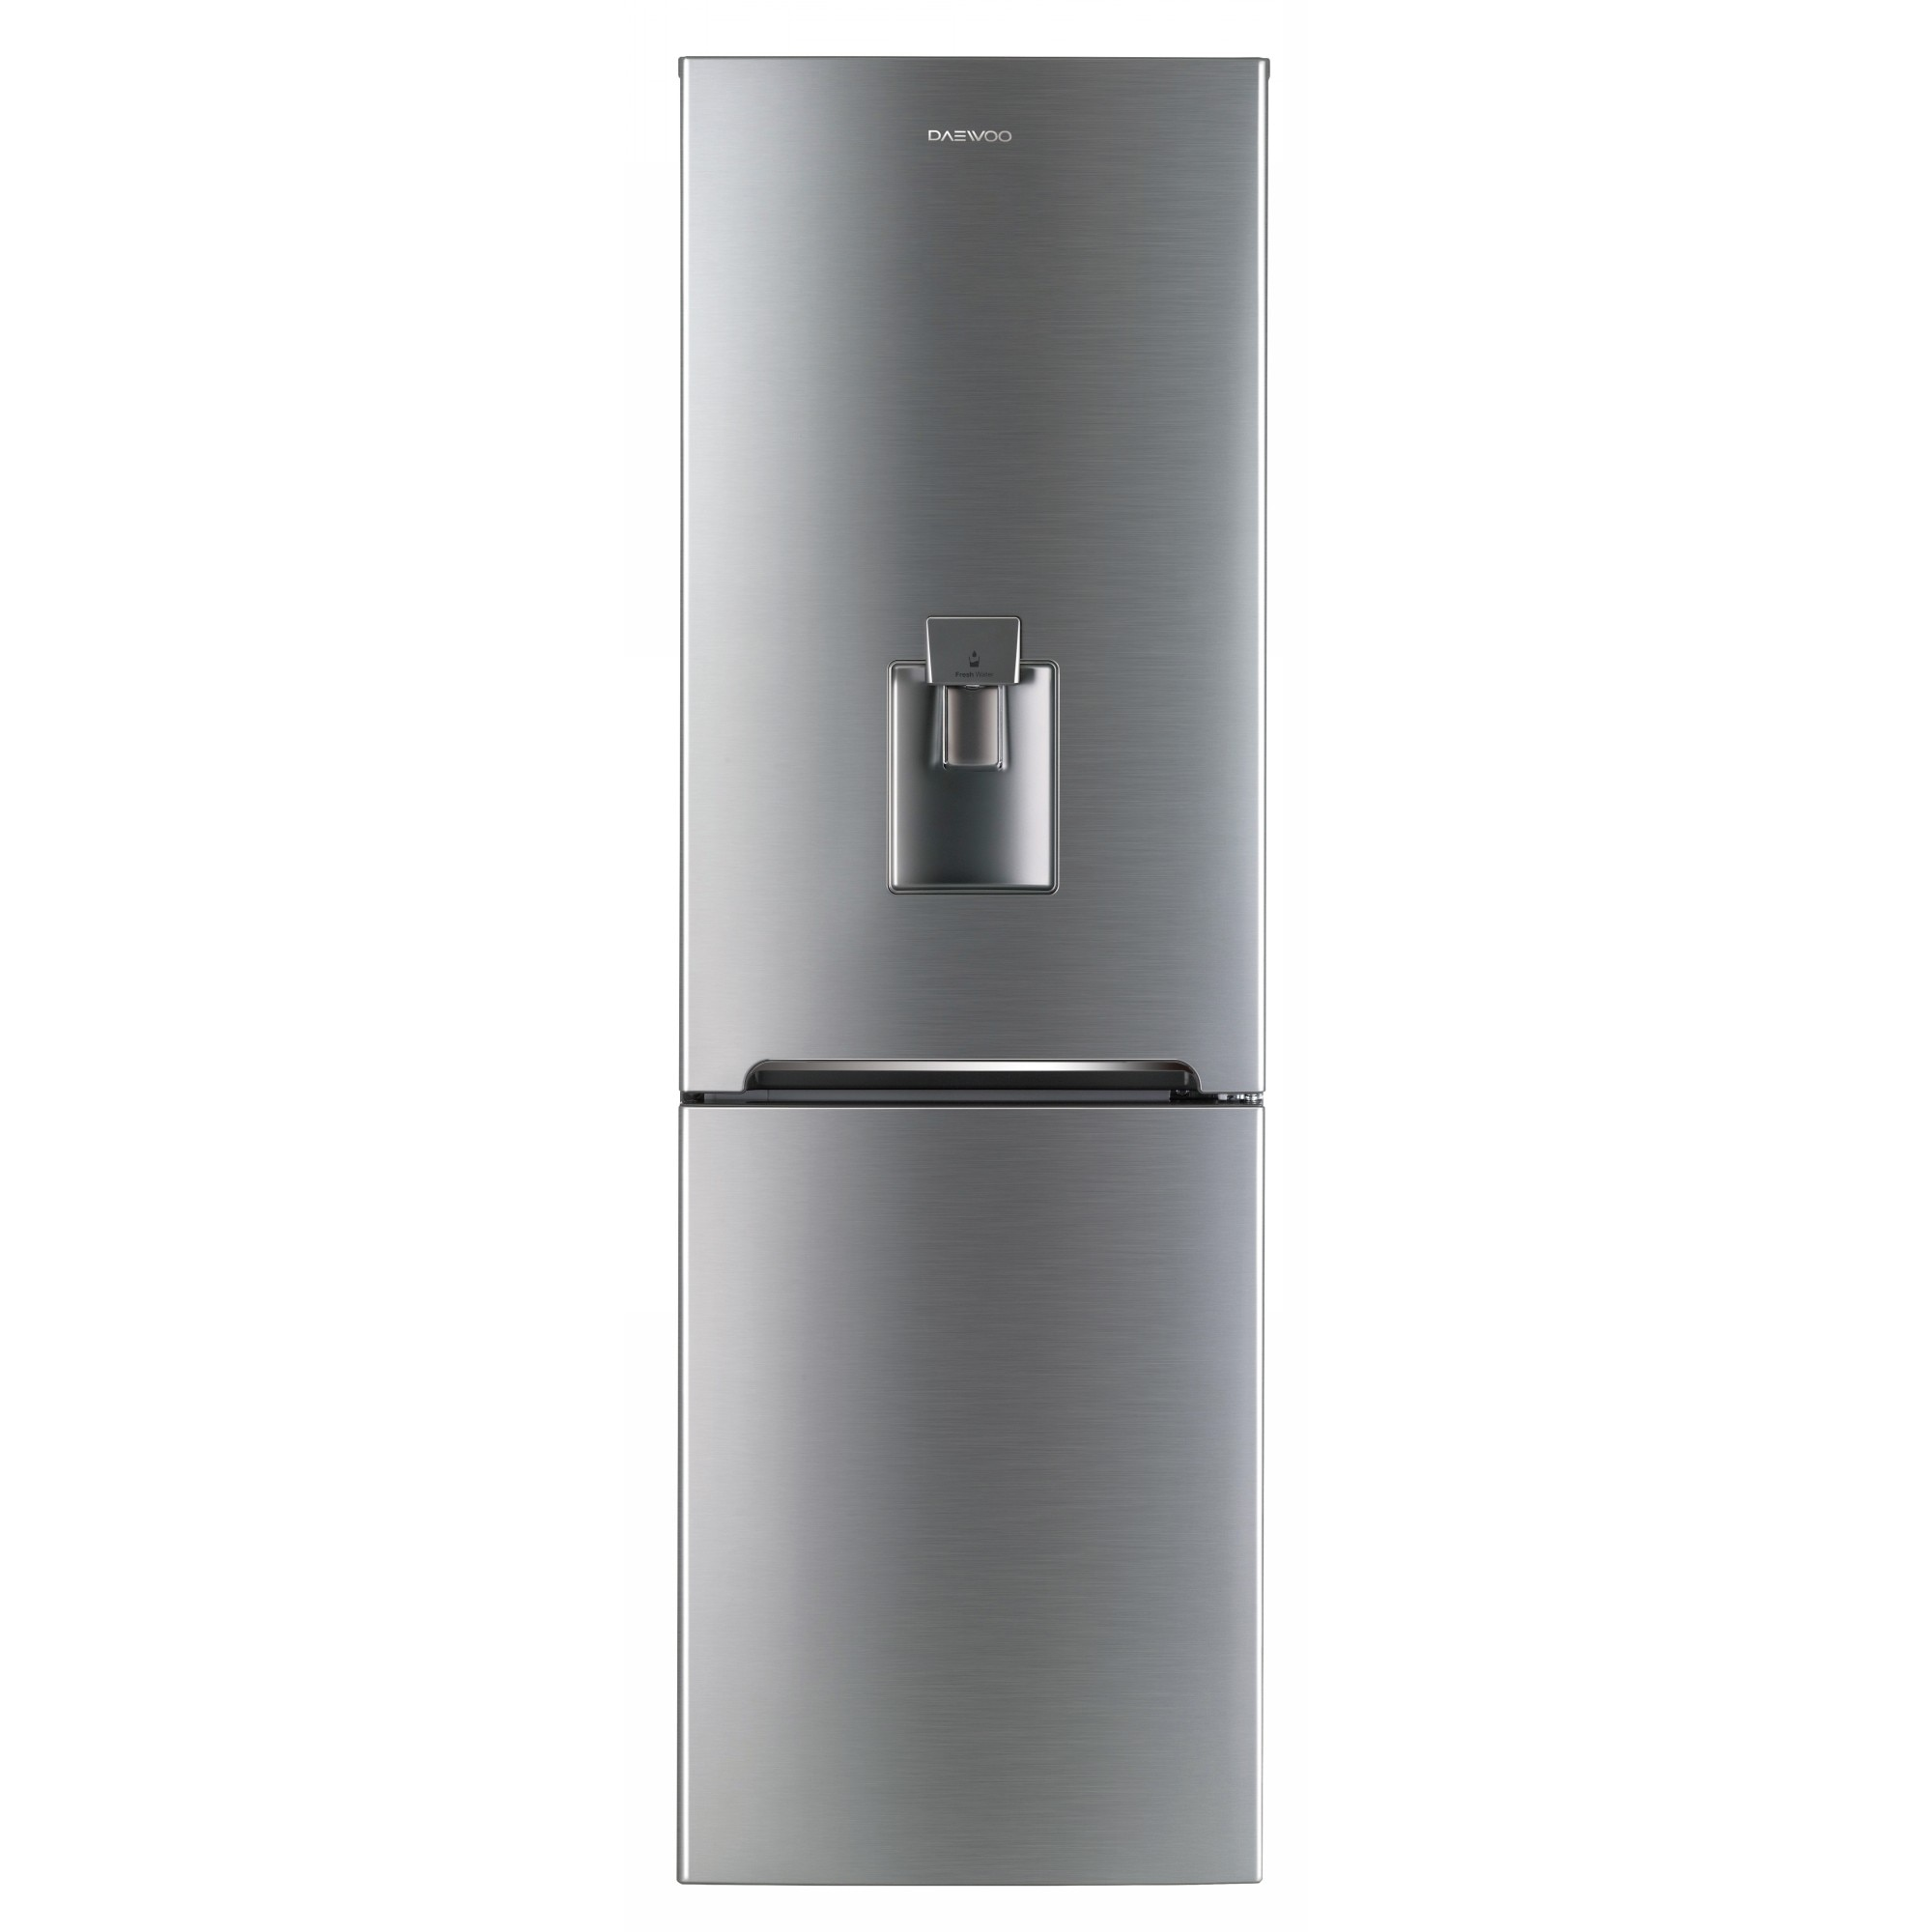 Fotografie Combina frigorifica Daewoo RN-308RDQM, 305 l, Clasa A+, No Frost, Dispenser apa, H 187 cm, Silver